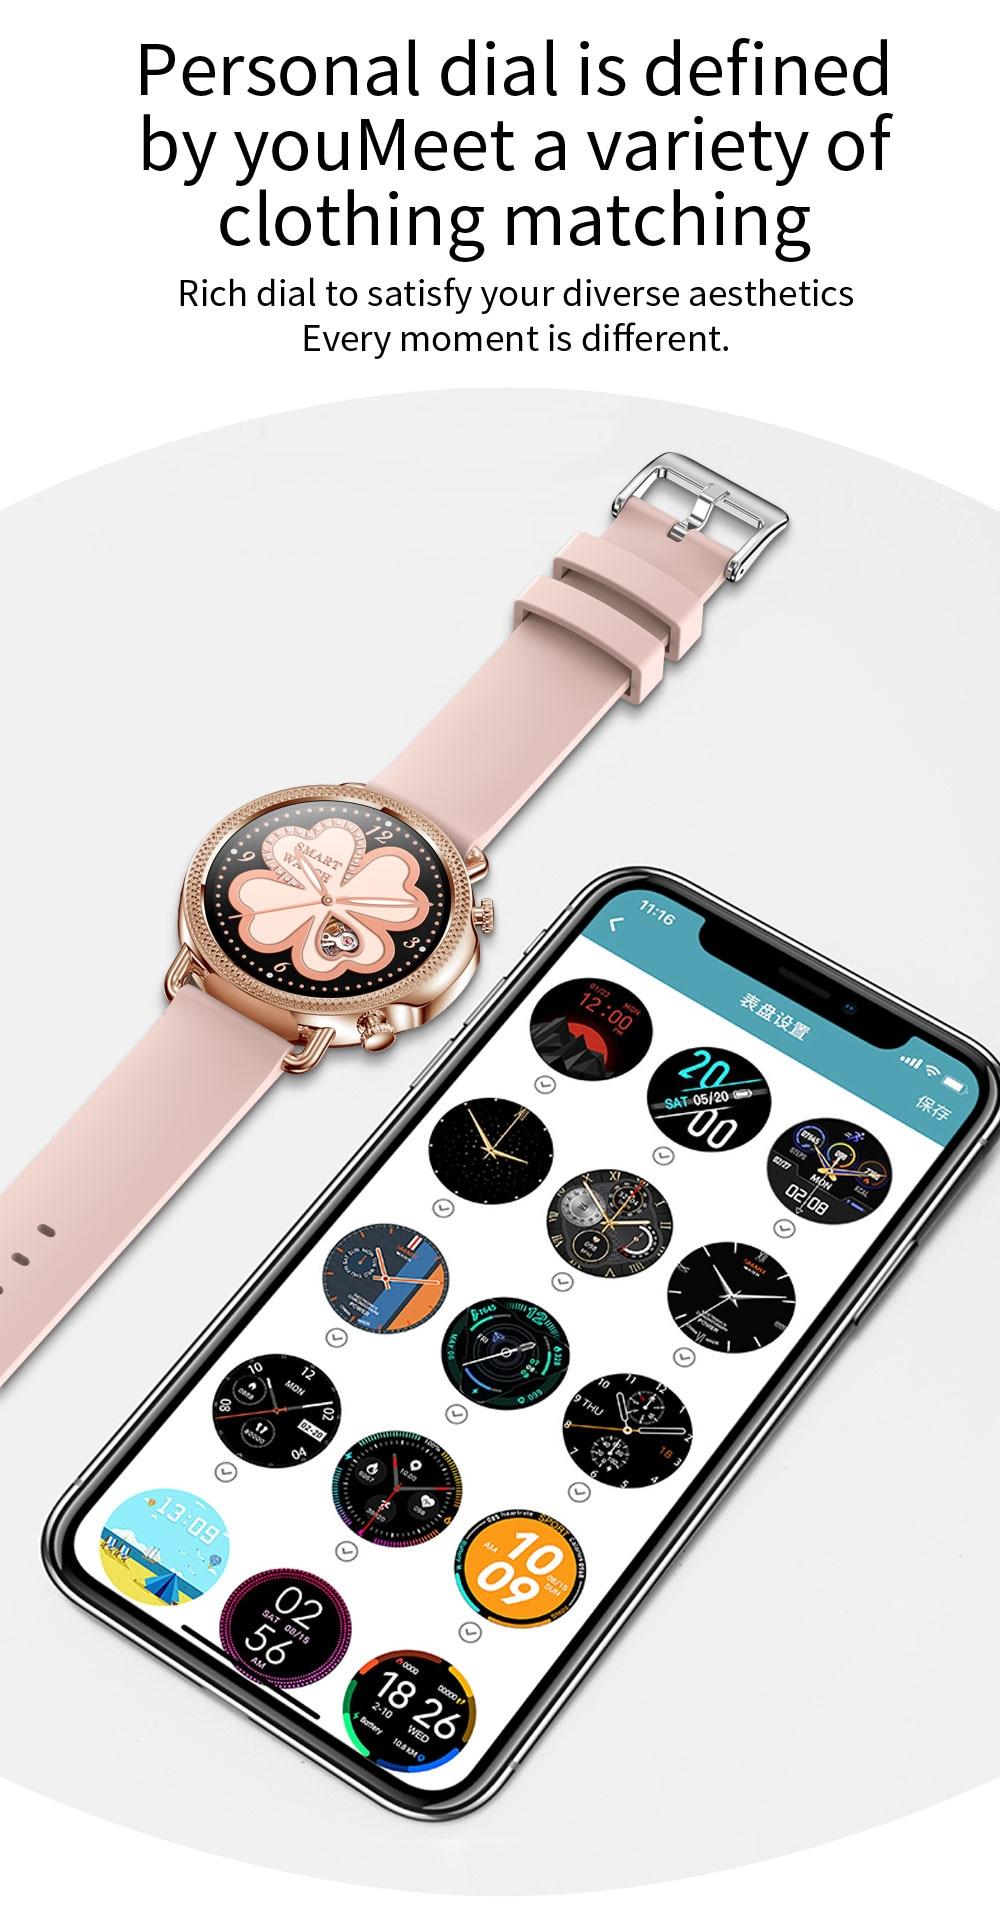 Hd7432652c40f46f988ed17eb823efba2l 2021 Women Smart Watch 1.28 inch HD Screen IP67 Waterproof Lady's Watches Body Temperature Heart Rate Monitor PK V23